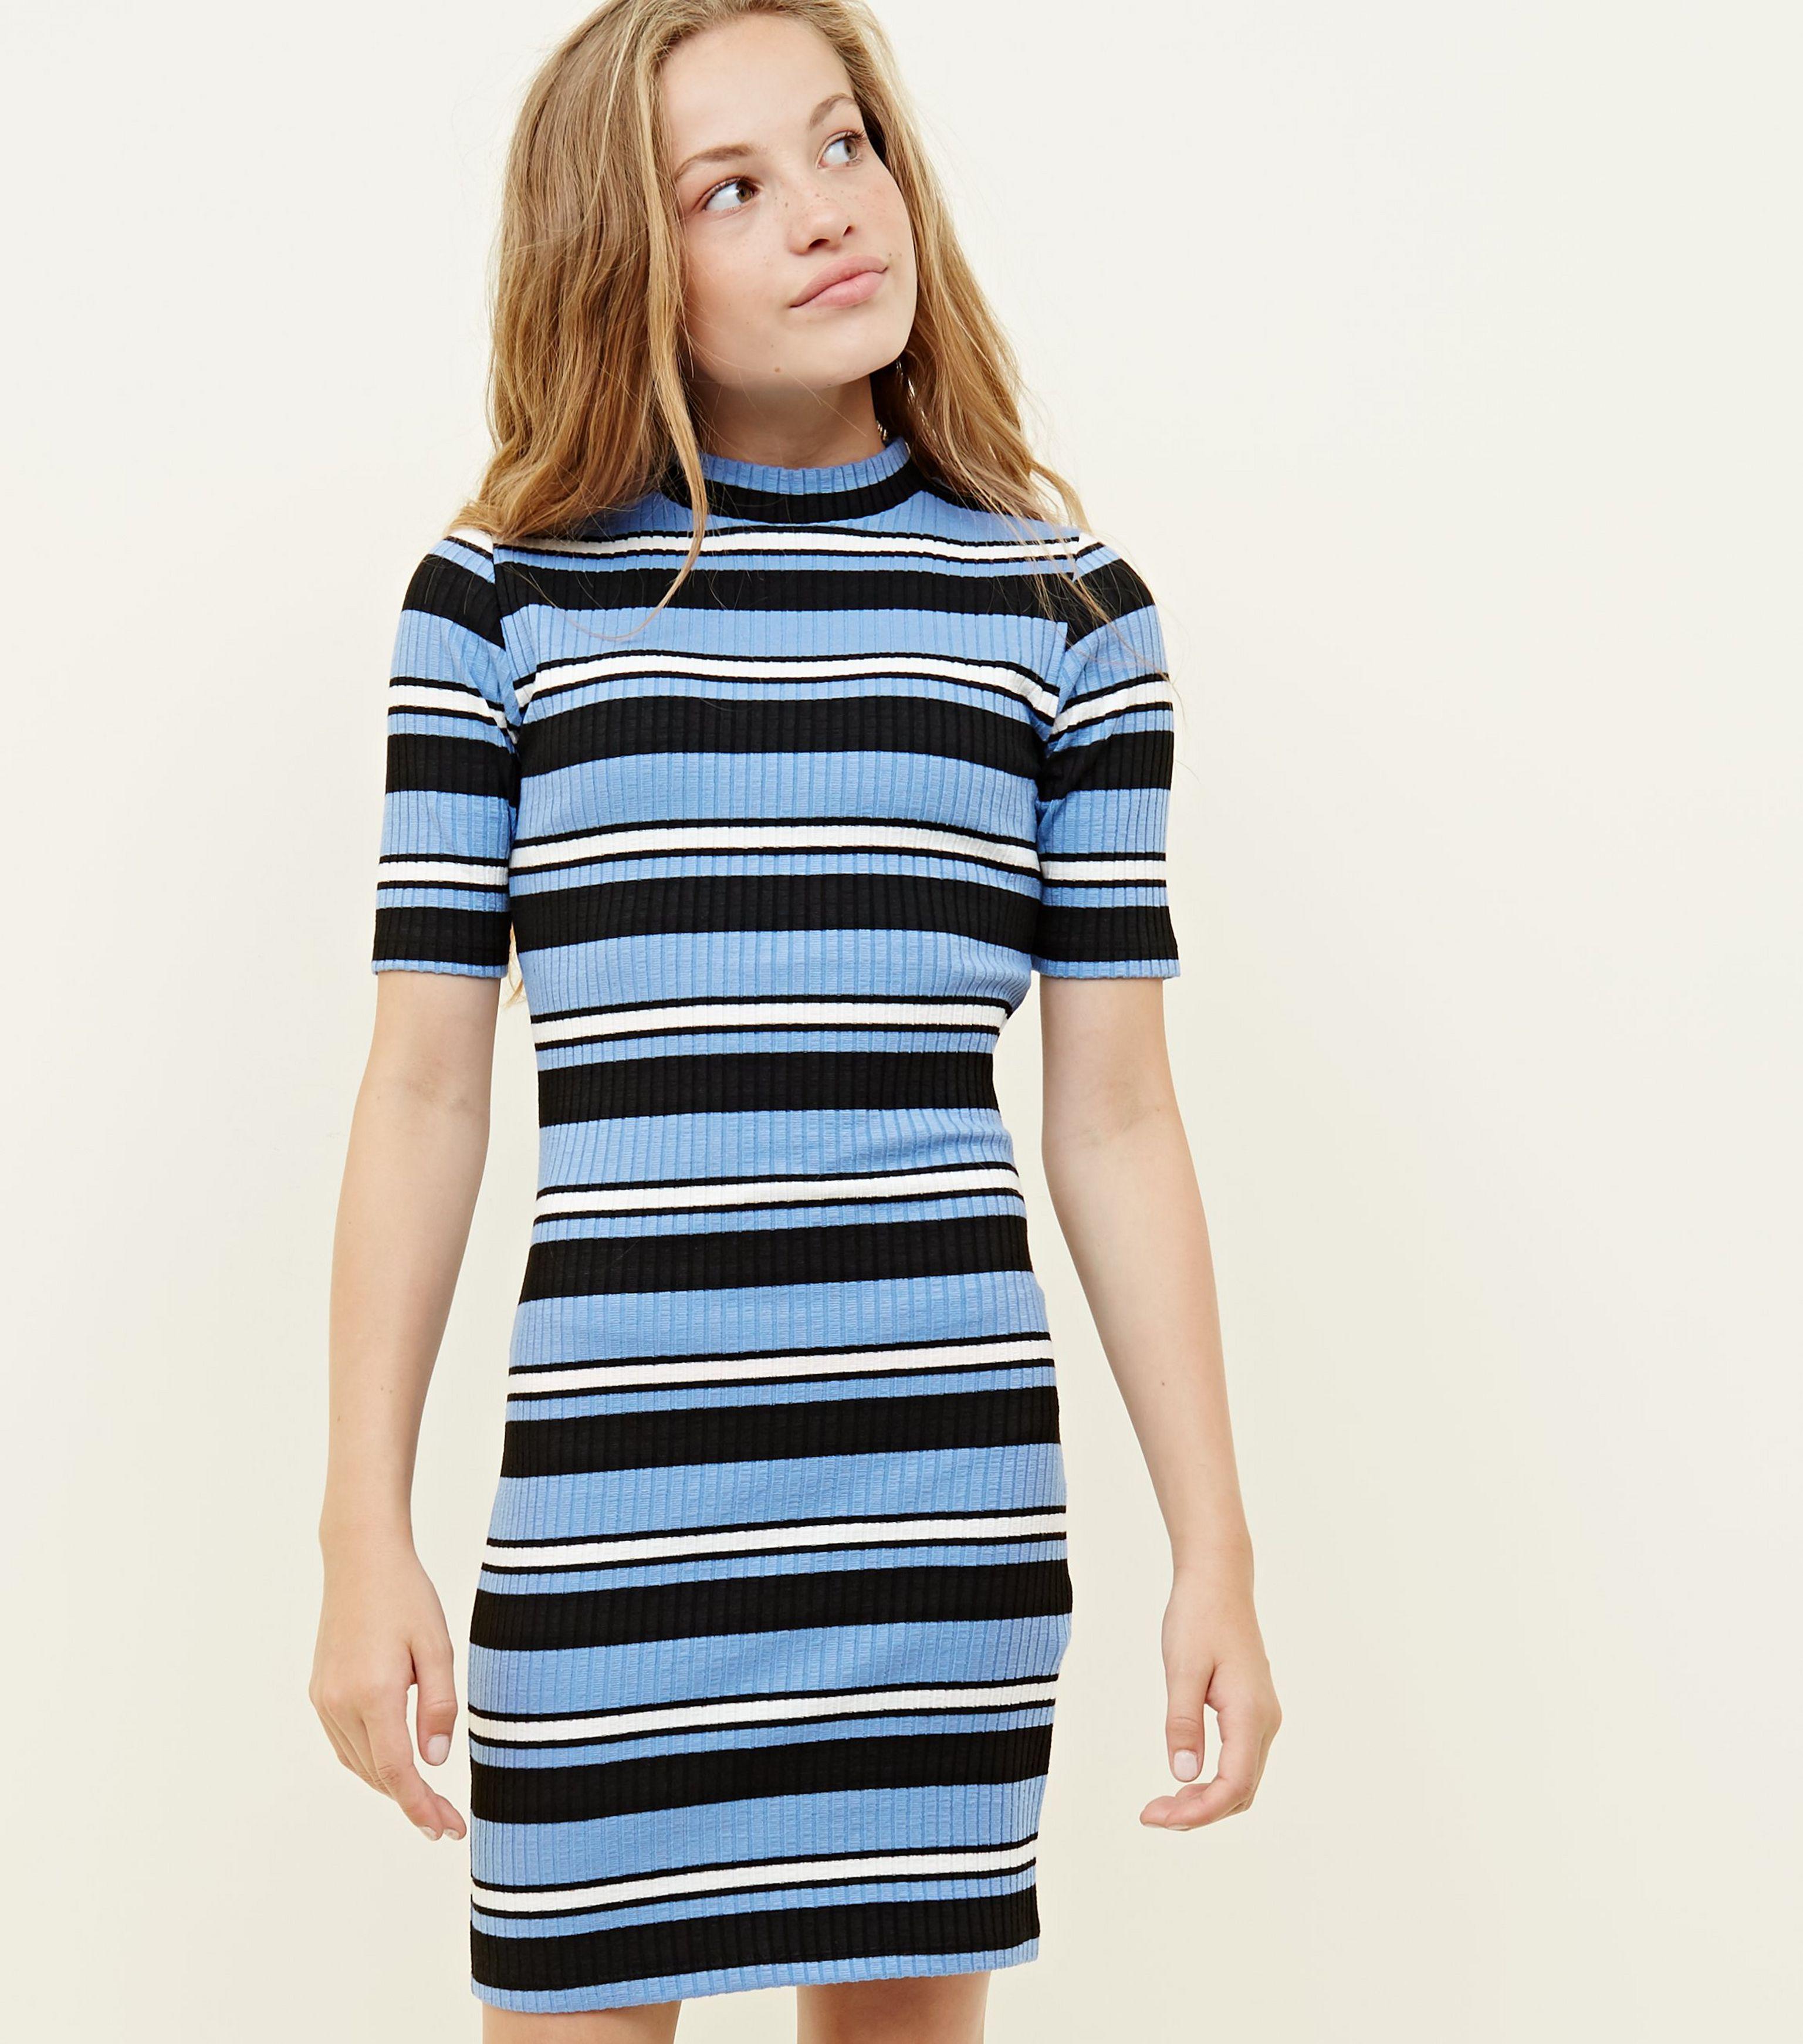 c466bdec2 New Look Girls Blue Stripe High Neck Bodycon Dress in Blue - Lyst